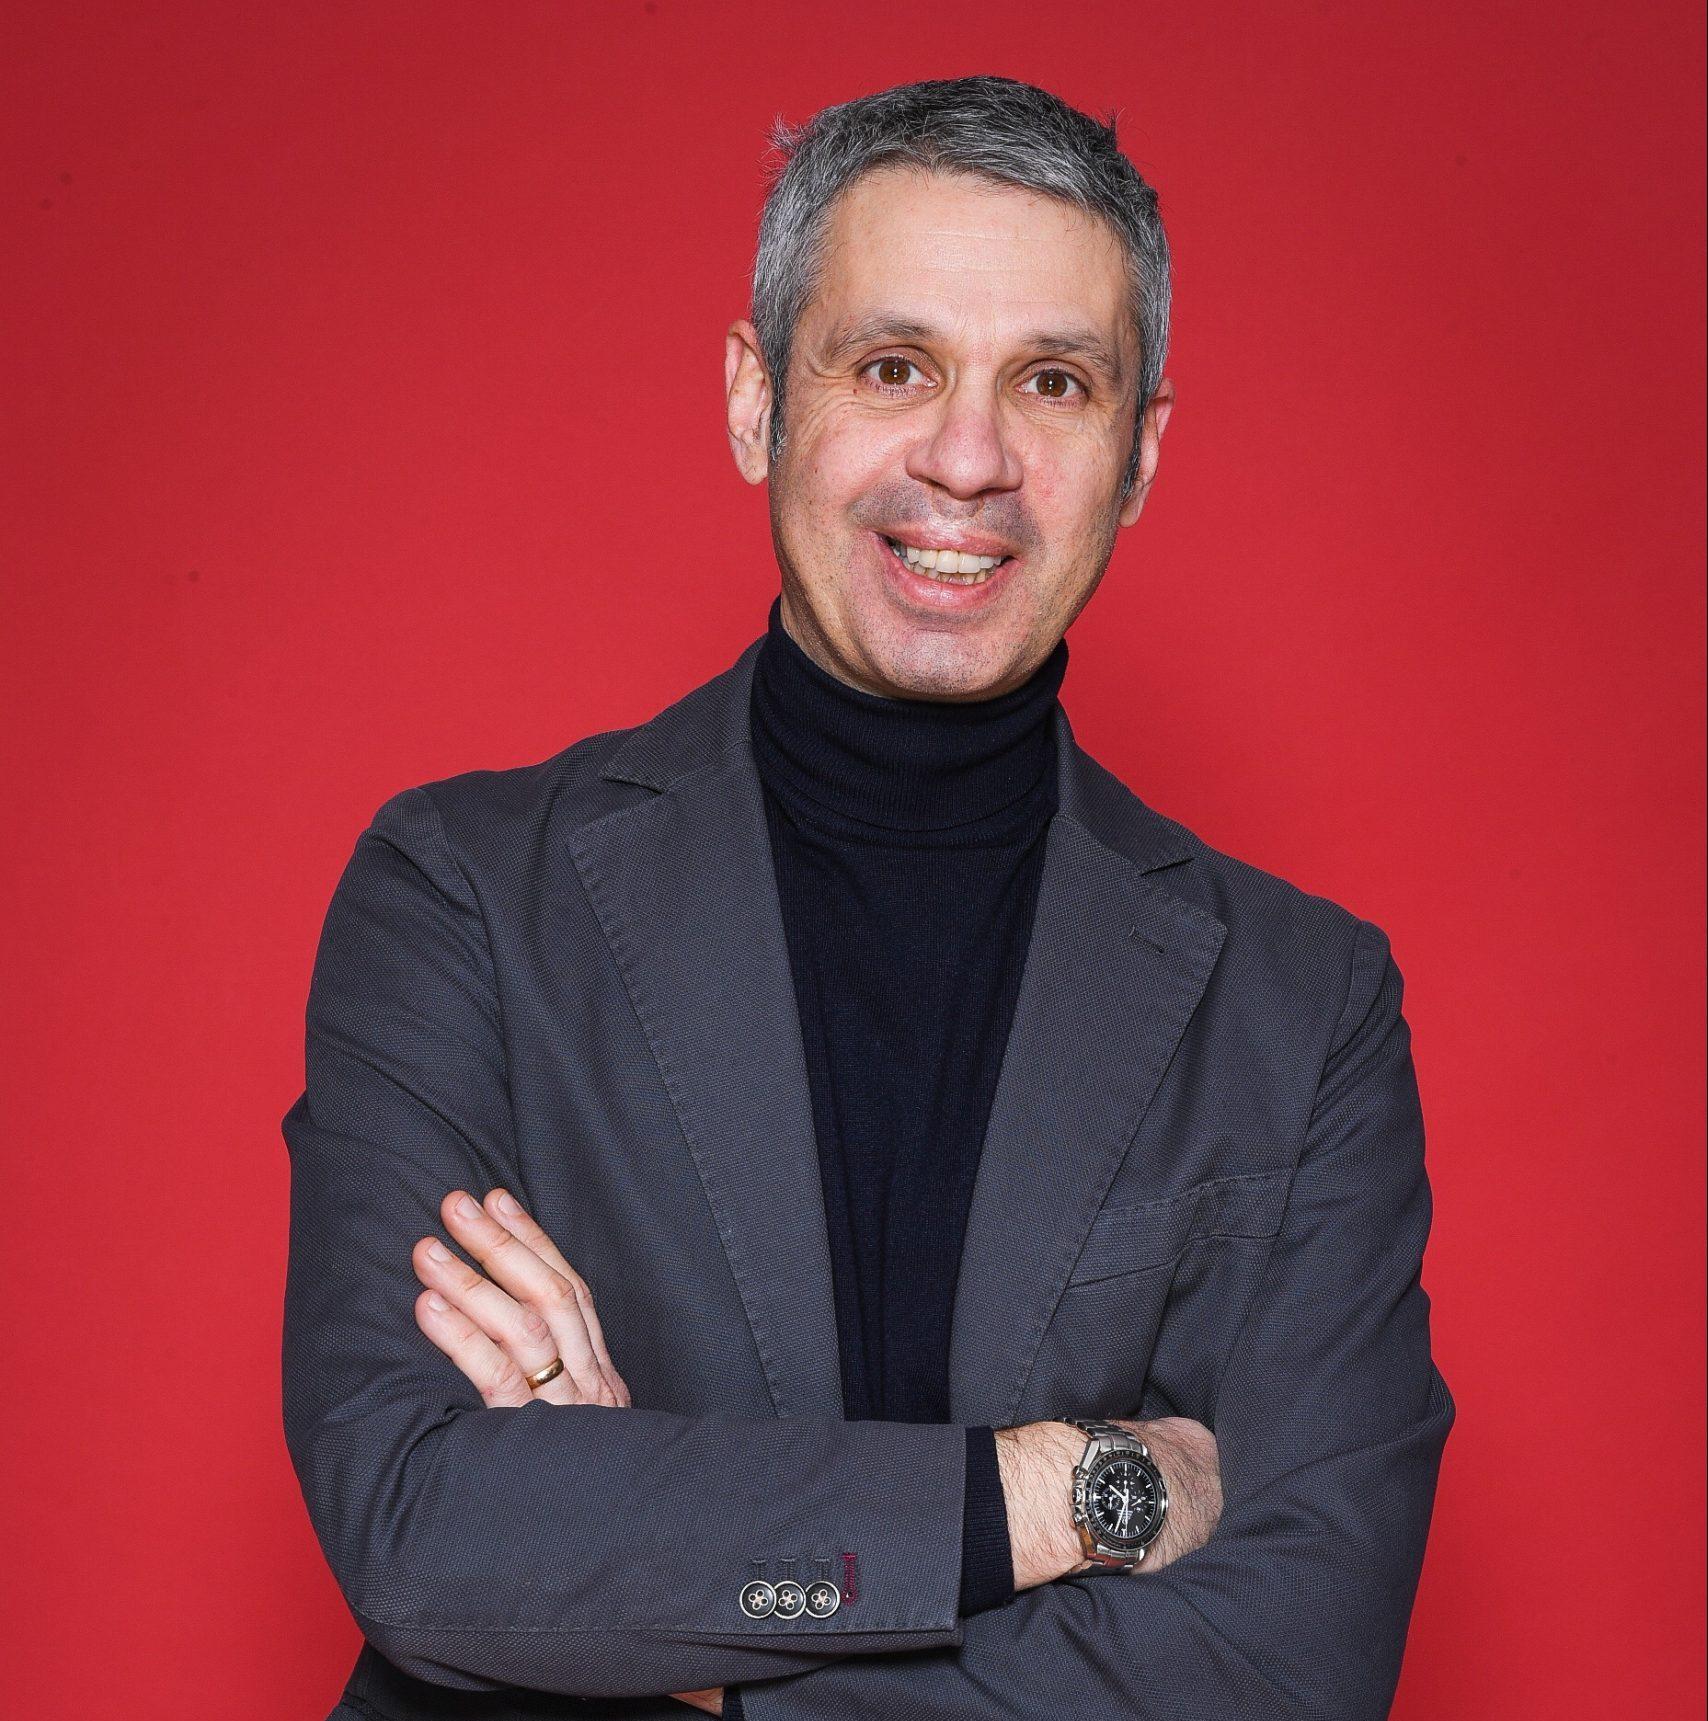 Fabio Luinetti